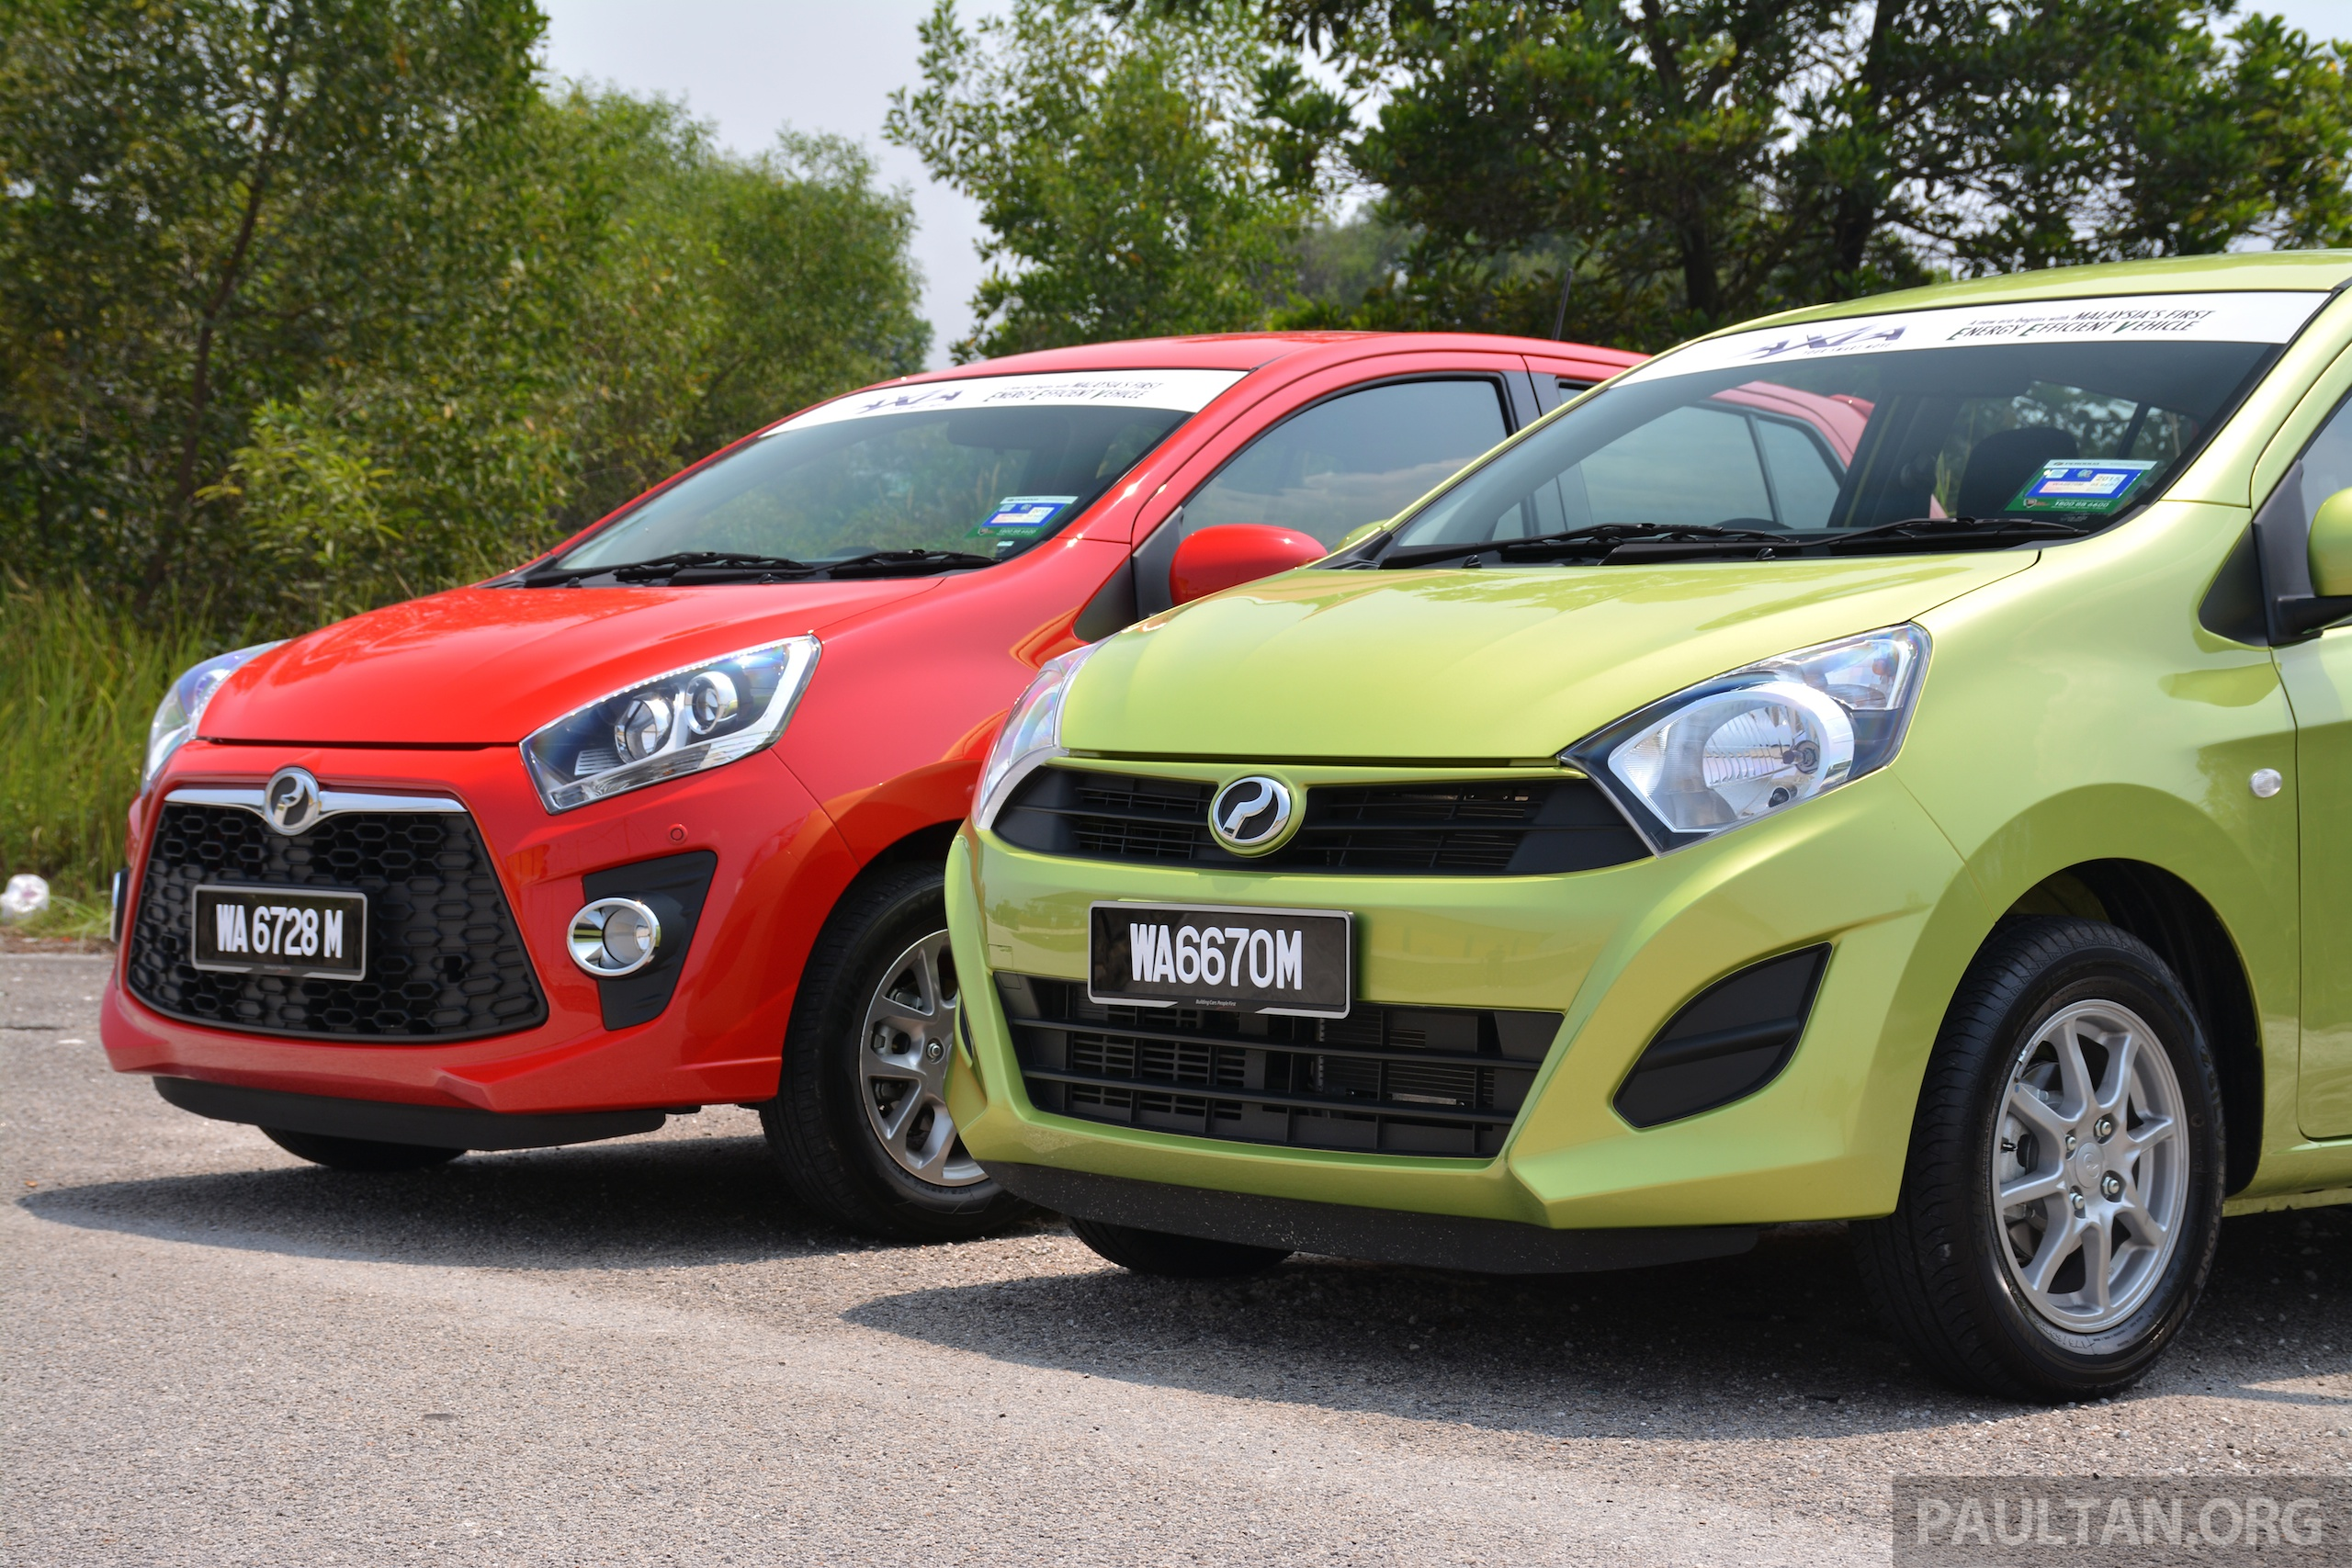 Gallery Perodua Axia Standard G Vs Axia Advance